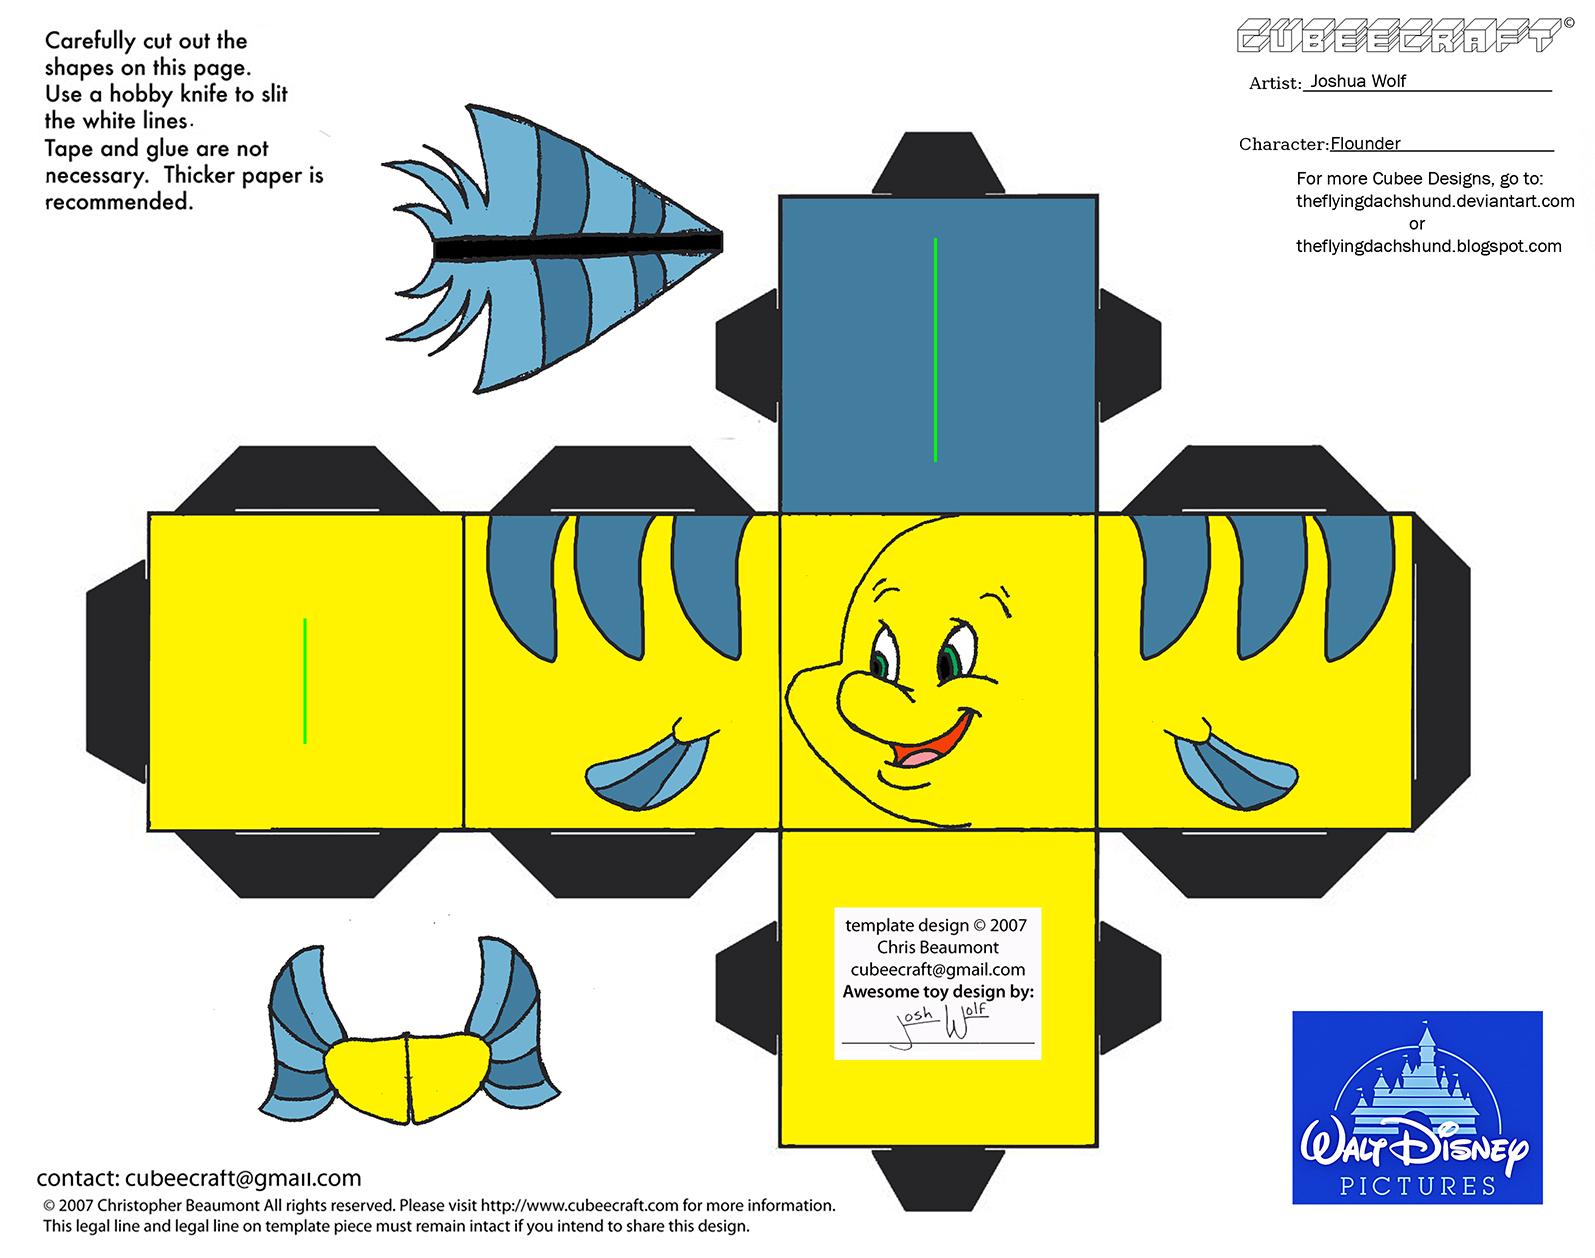 Wallpaper Minecraft 3d Dis43 Flounder Cubee By Theflyingdachshund On Deviantart